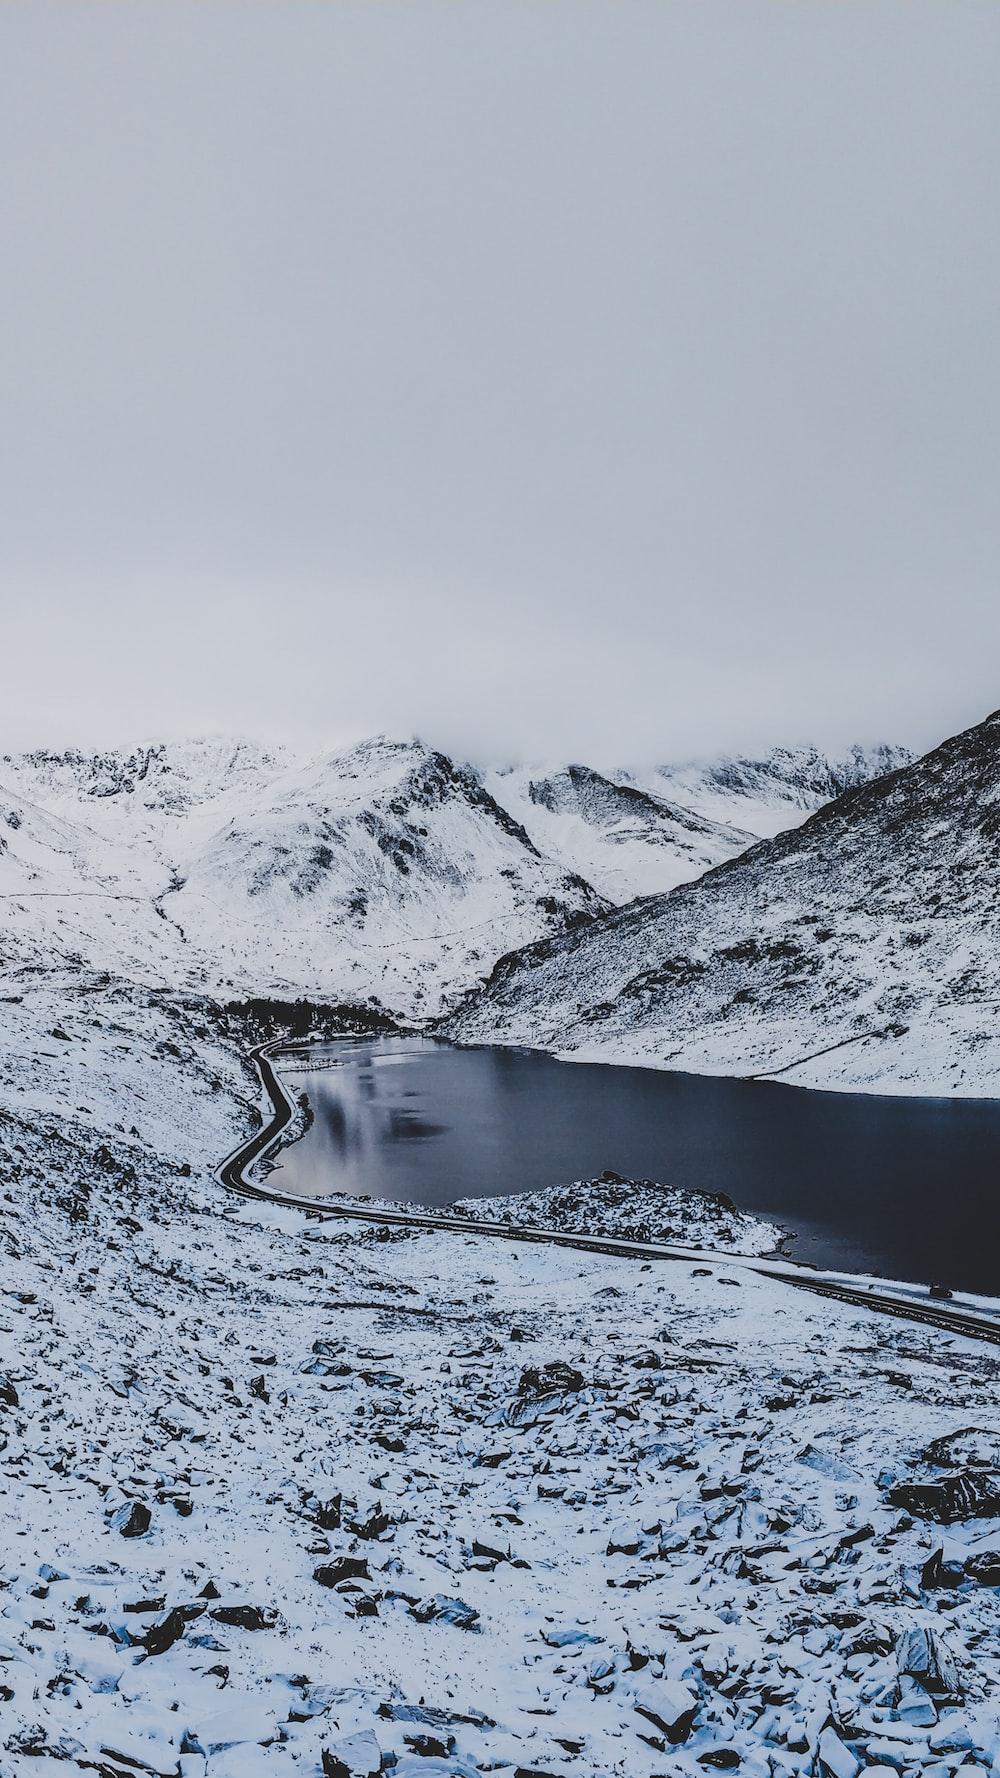 body of water between mountain